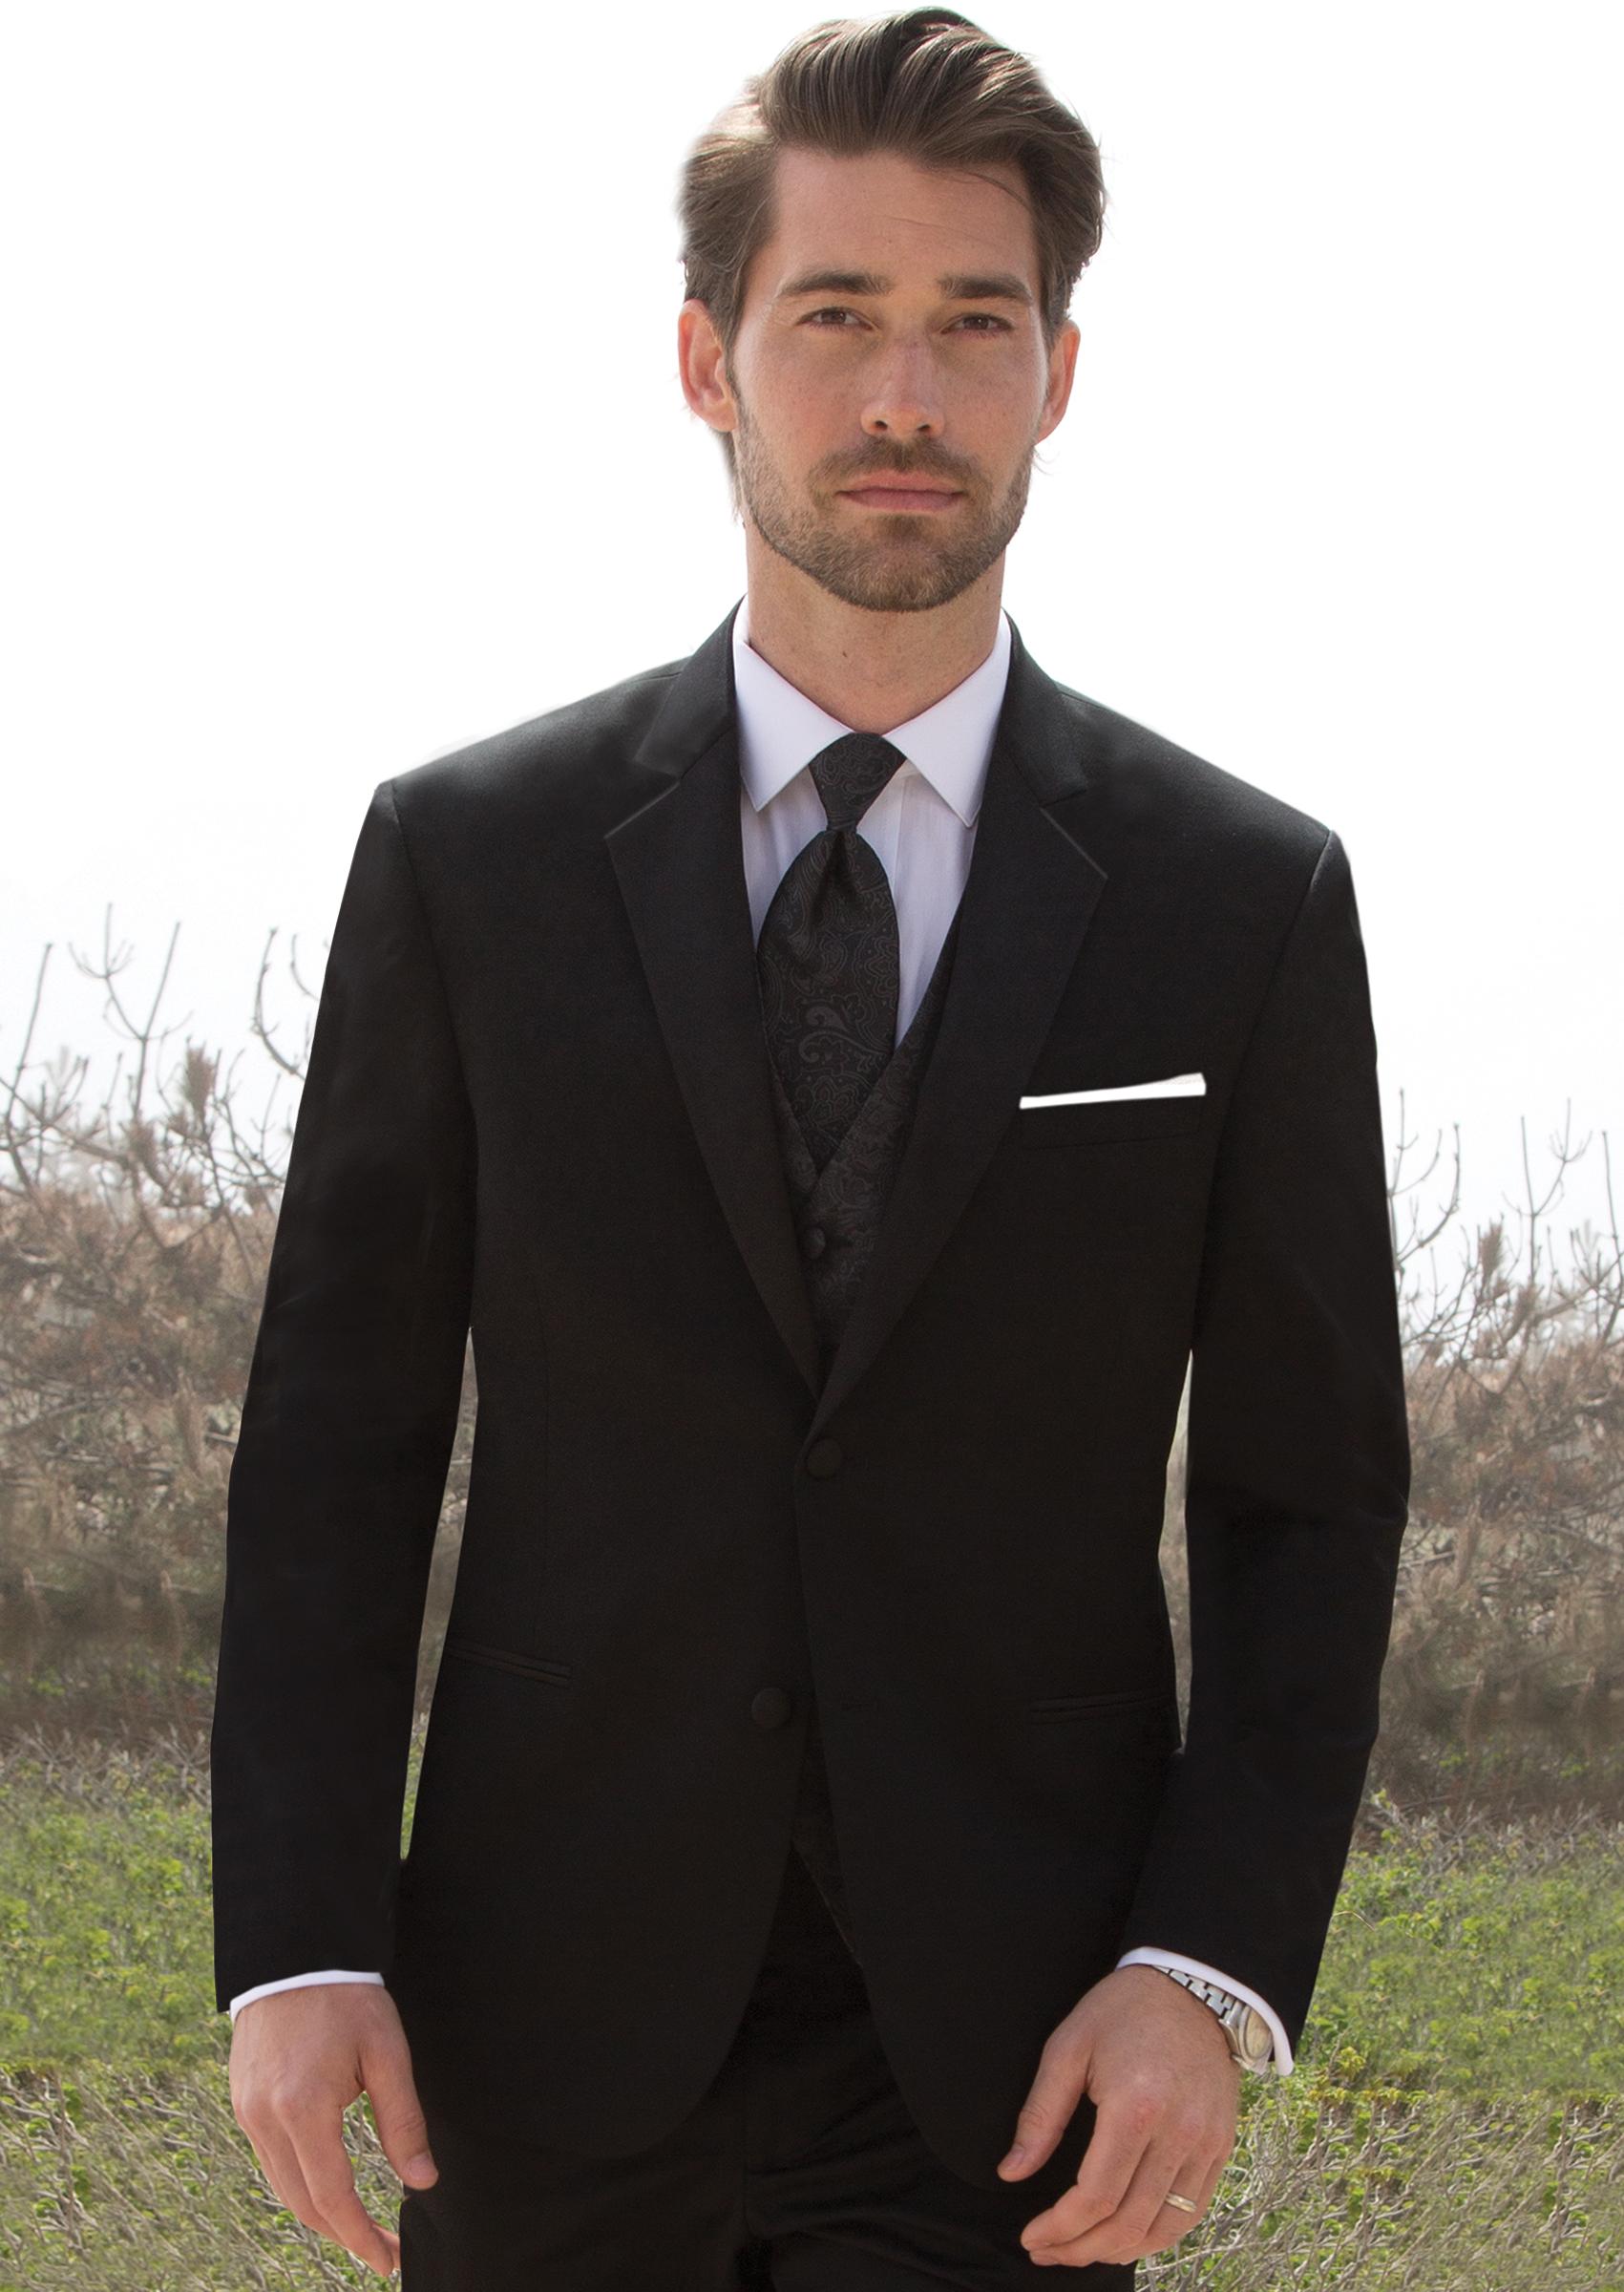 SPECIAL ORDER GOWNS Black Desire Michael Kors – Bridal Elegance